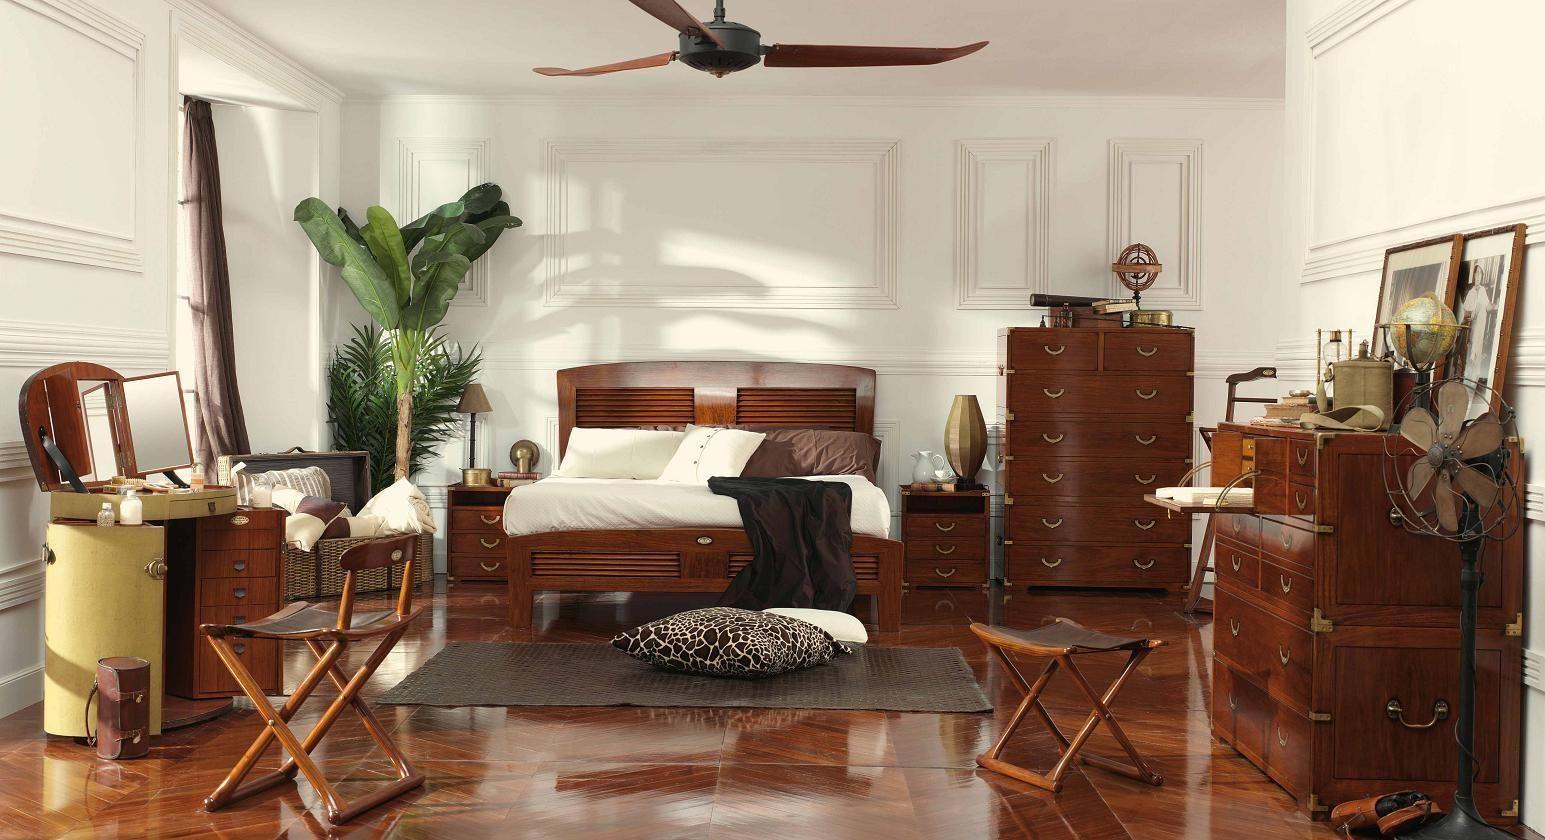 100 Fantastique Suggestions Décoration Chambre Style Colonial